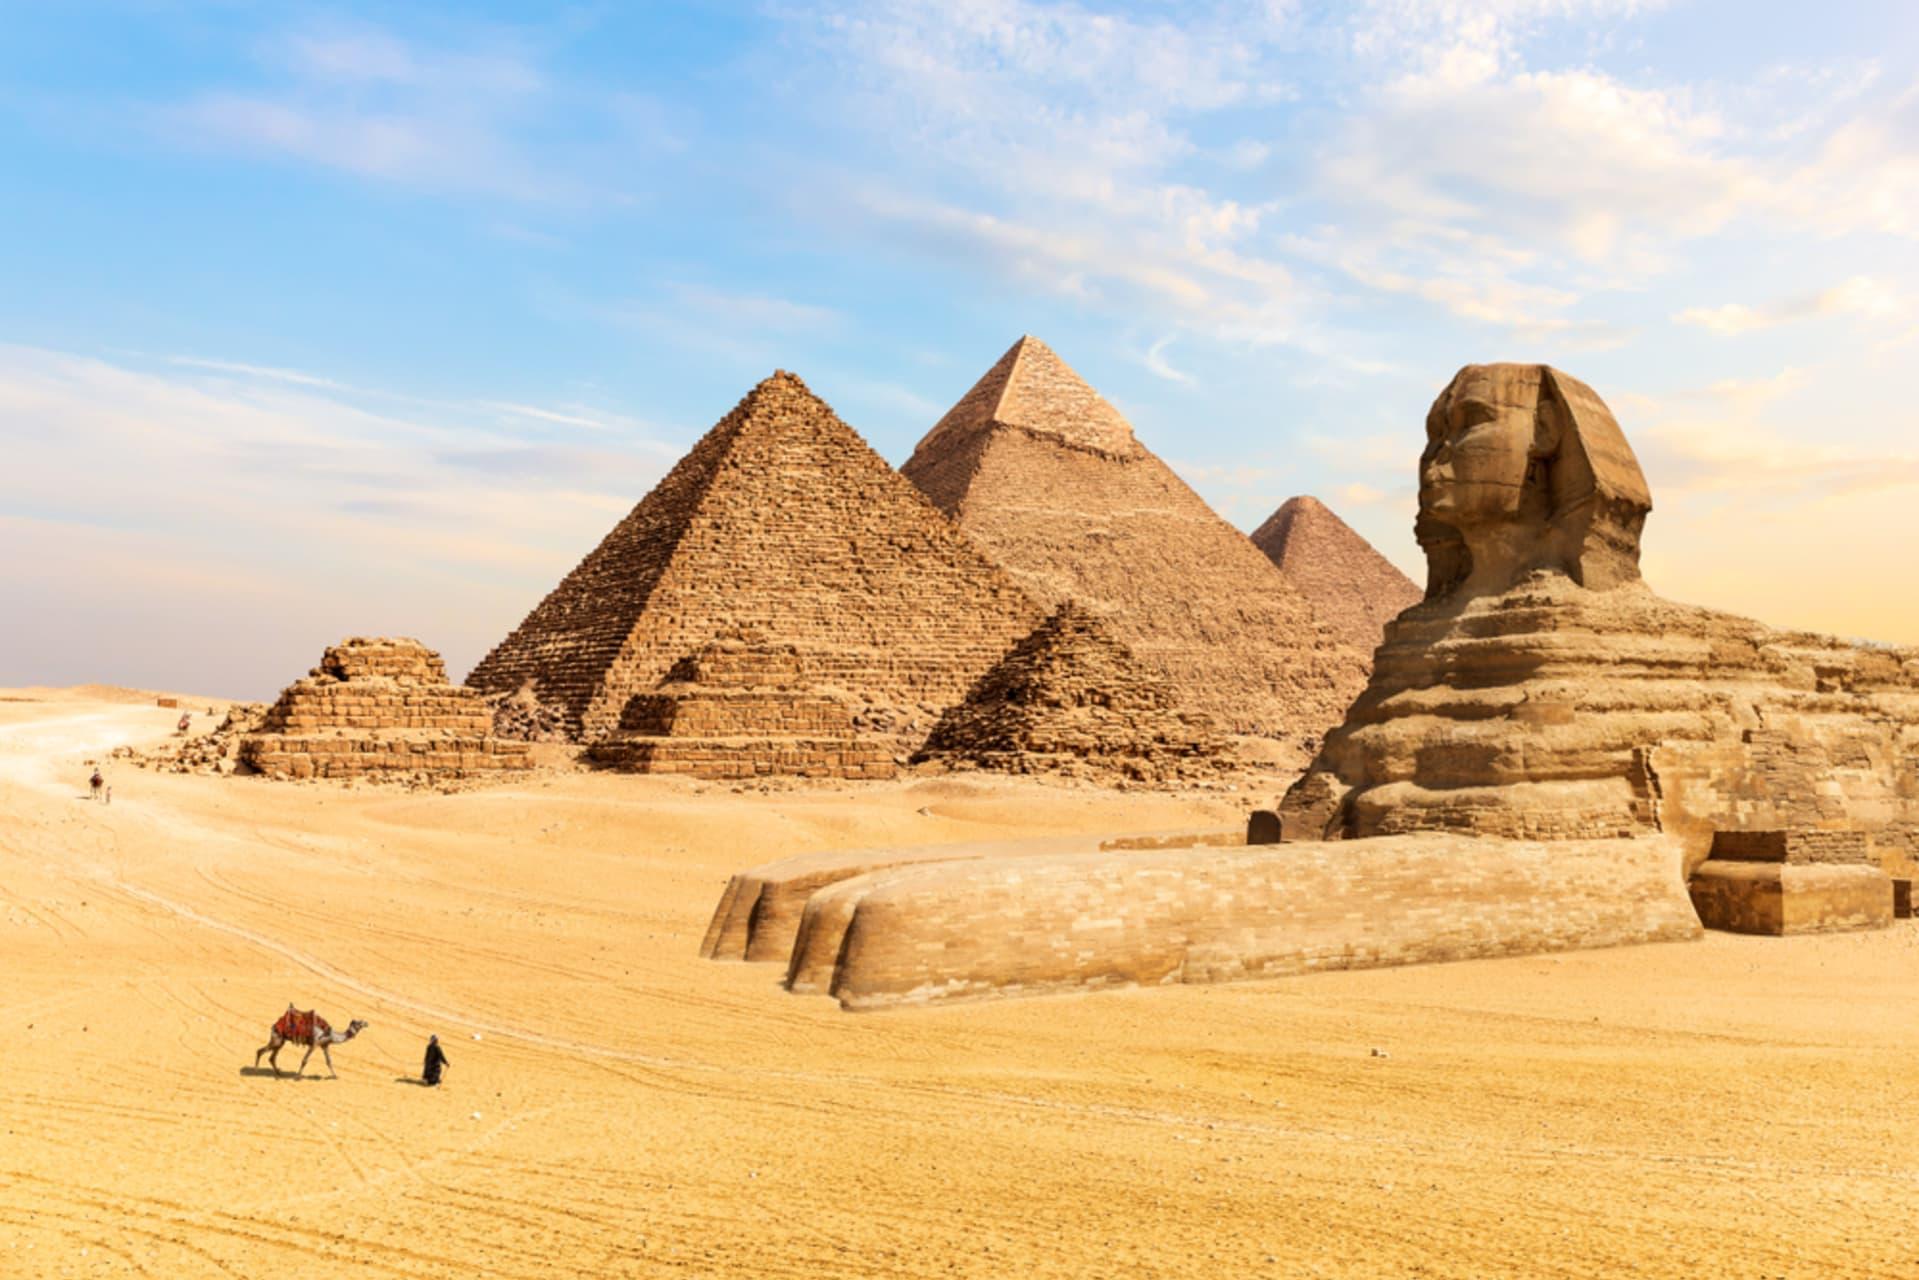 Cairo - Pyramids Of Giza